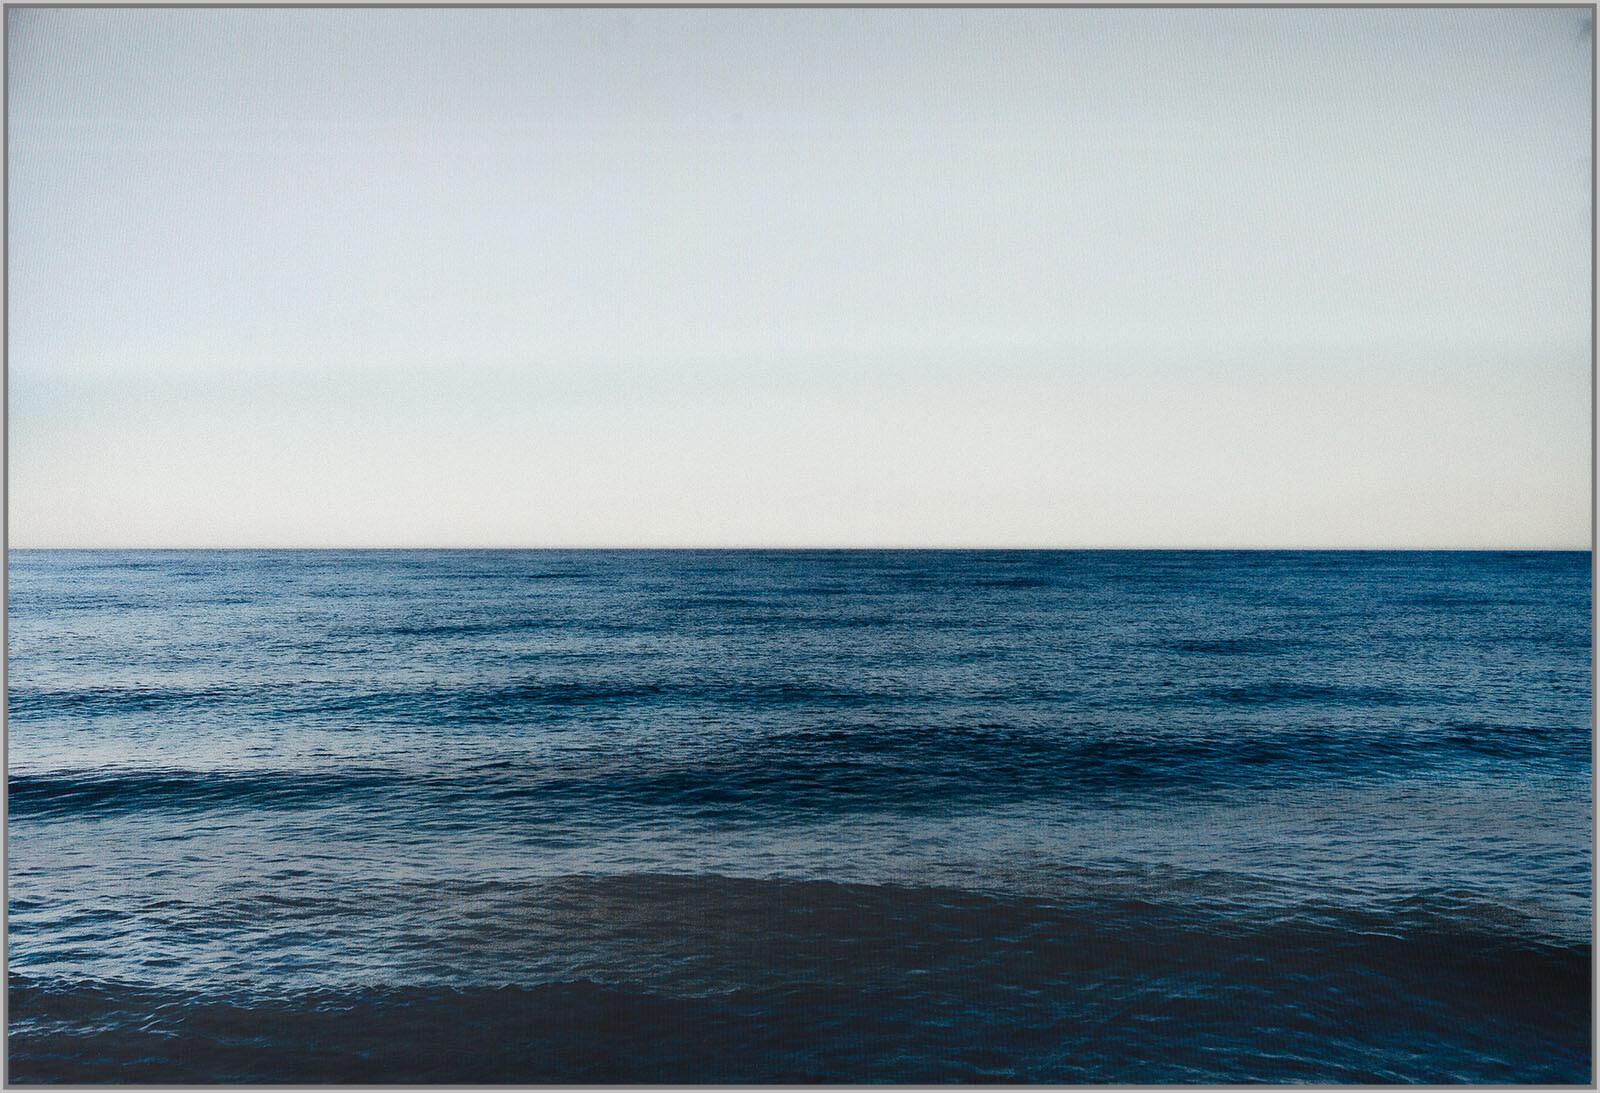 Seesaw Seascape II - Wolfgang Uhlig